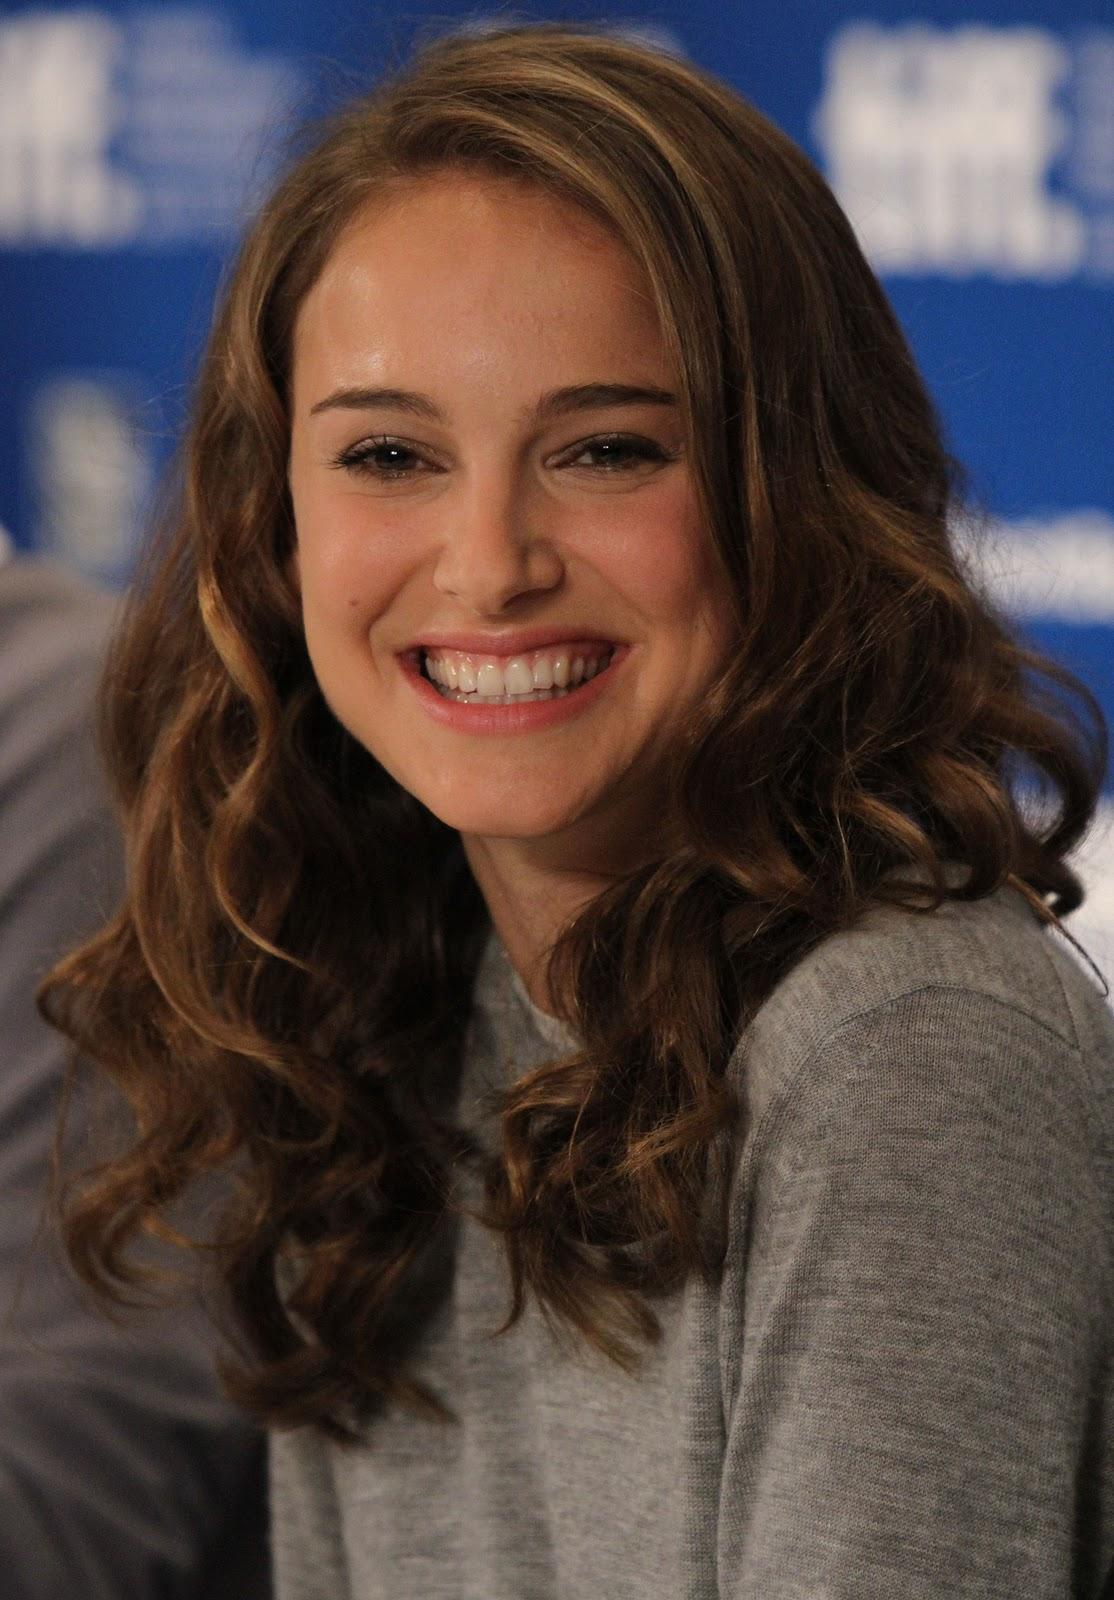 Natalie Portman Pictures Gallery 14  Film Actresses-8362